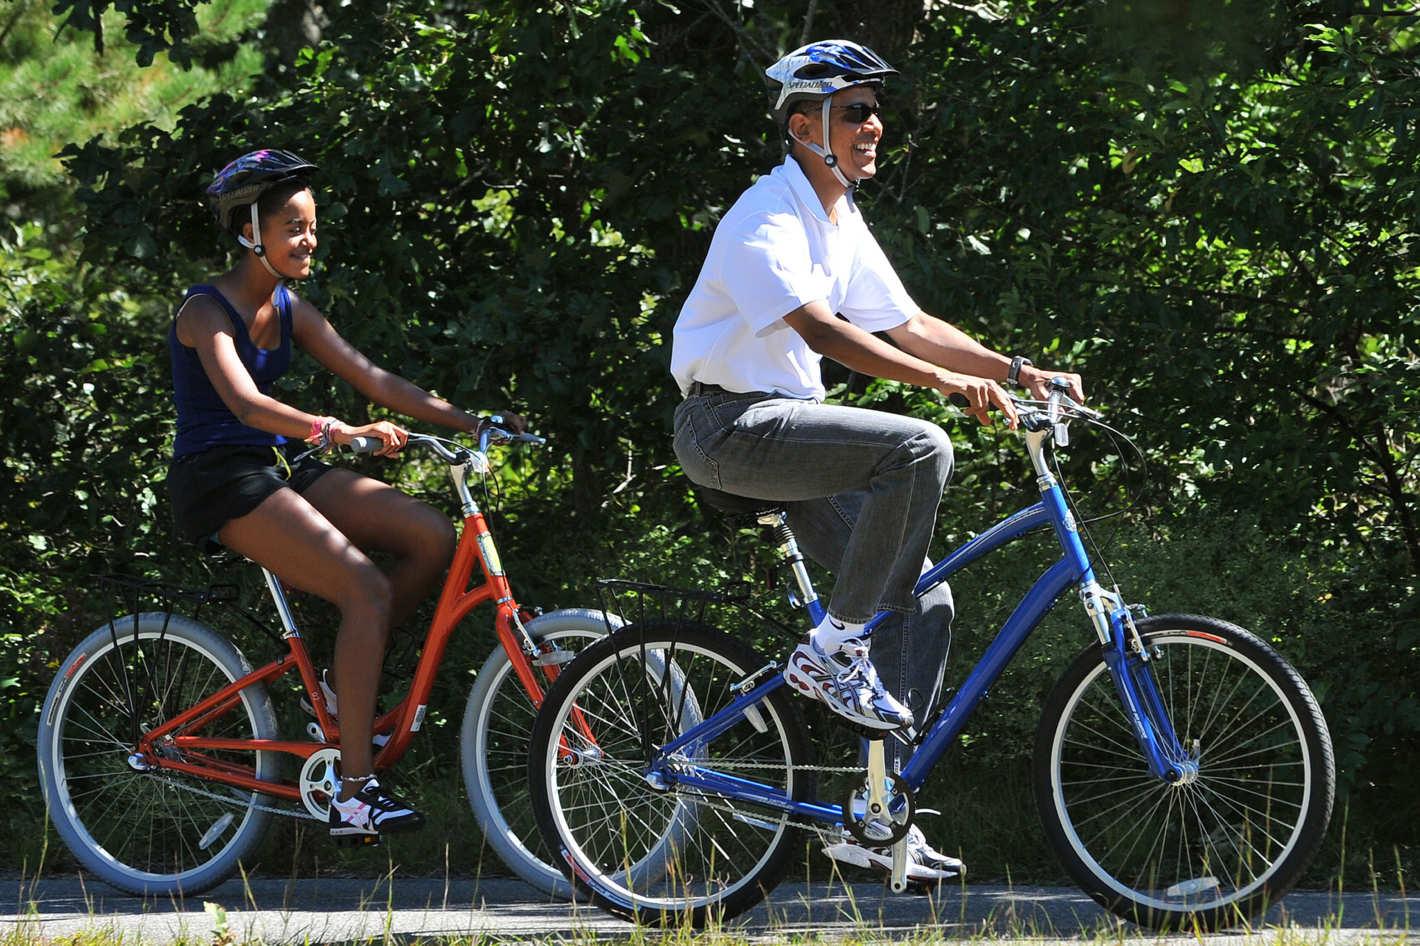 obama mom jeans on bike blank template imgflip